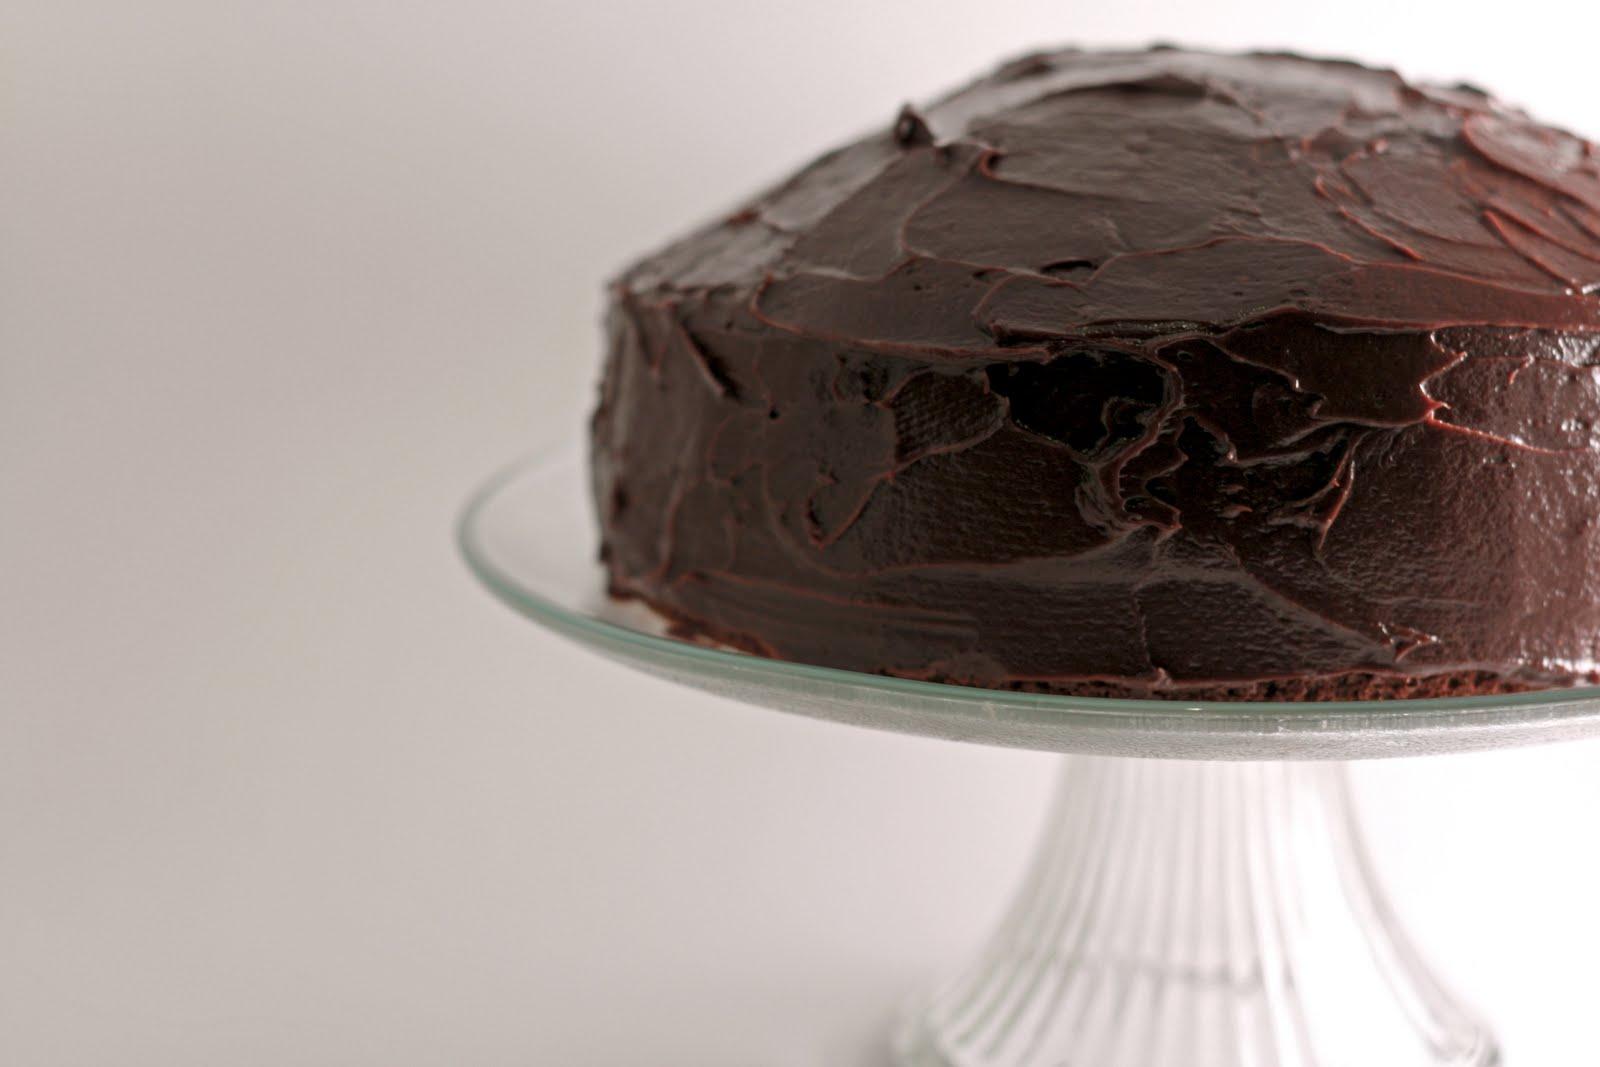 Flourishing Foodie: The Most Amazing Chocolate Cake (ever)